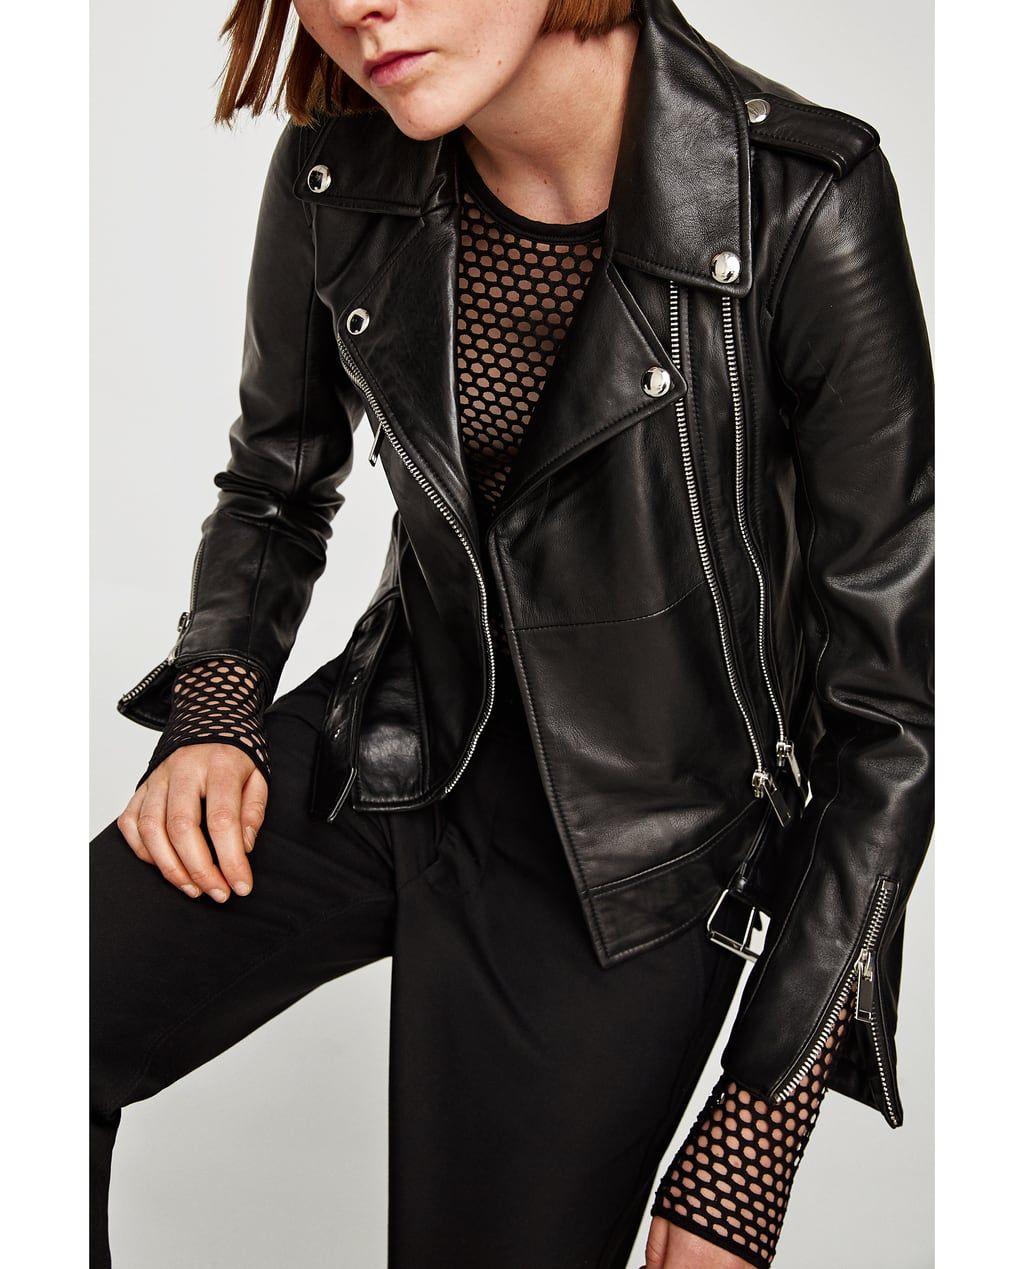 Leather Biker Jacket Jackets Woman Zara United States Biker Jacket Clothes Jackets [ 1269 x 1024 Pixel ]